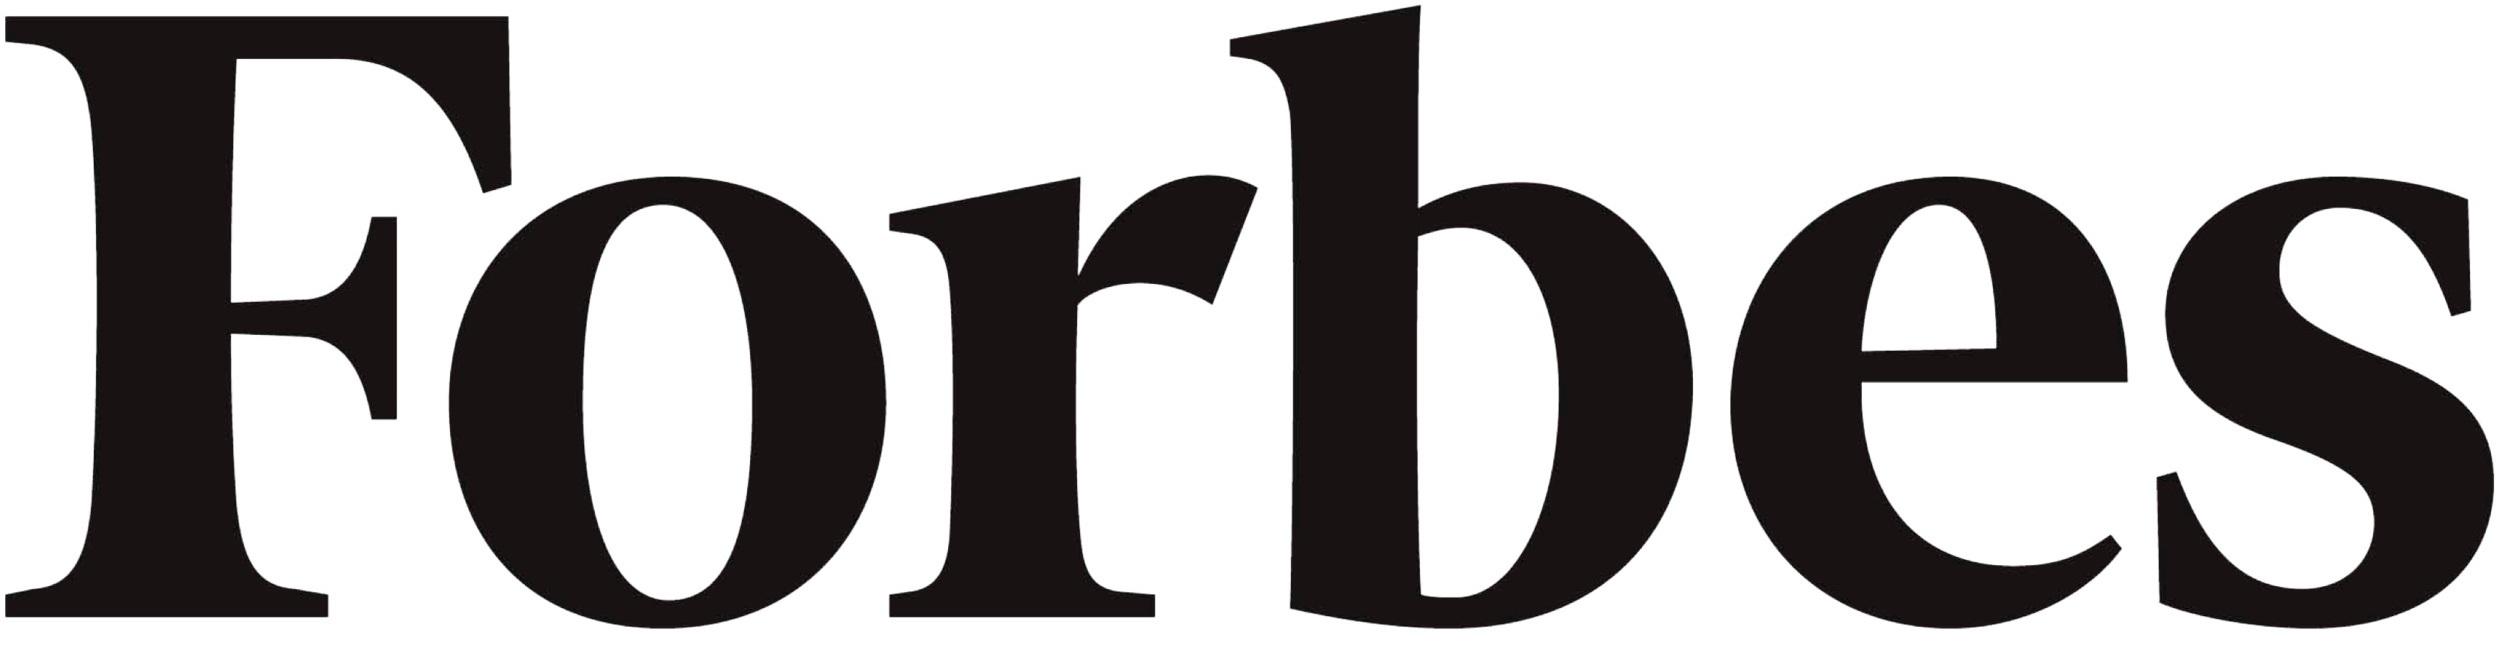 Forbes-Black-Logo-PNG-03003.jpg